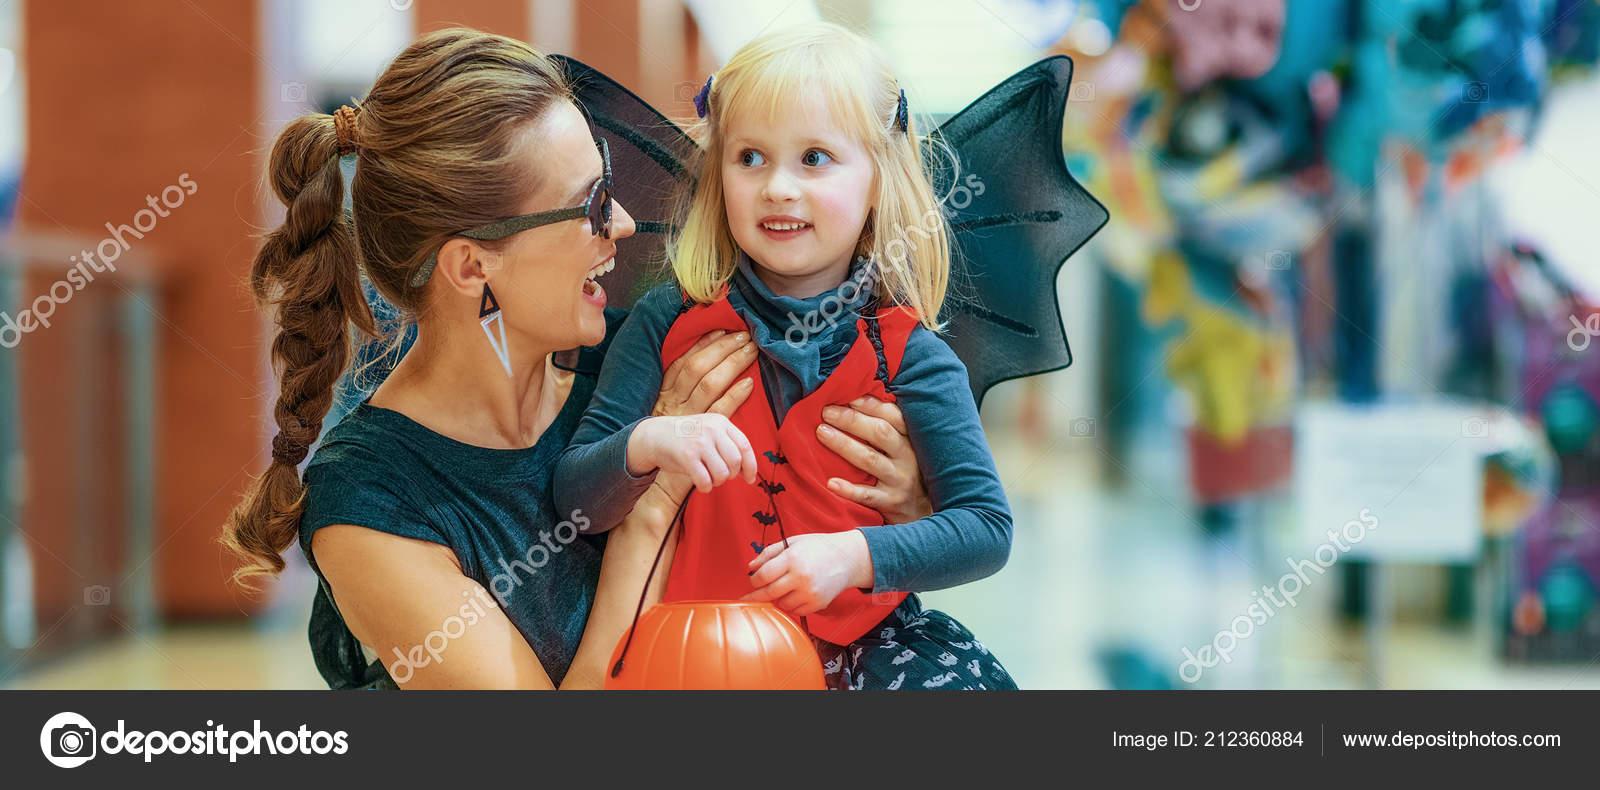 Smiling Elegant Mother Daughter Bat Costume Halloween Mall